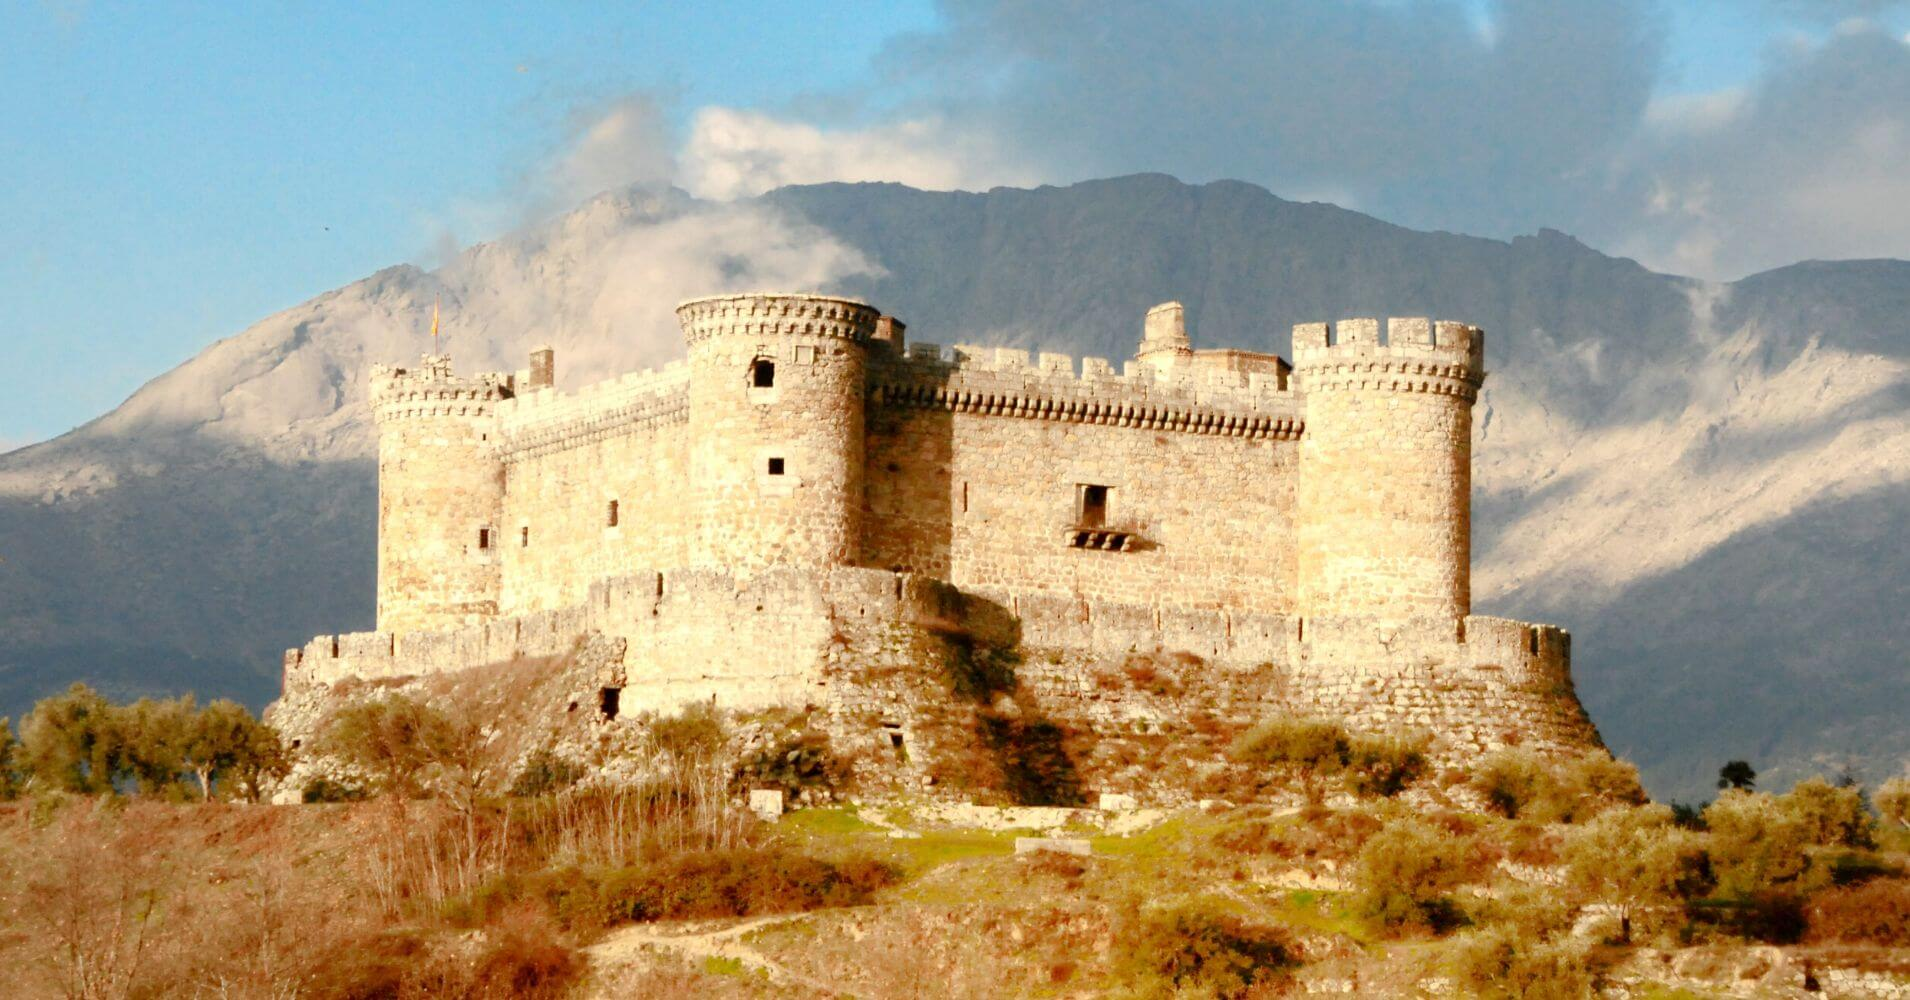 Castillo de Monbeltrán. Ávila. Castilla y León.